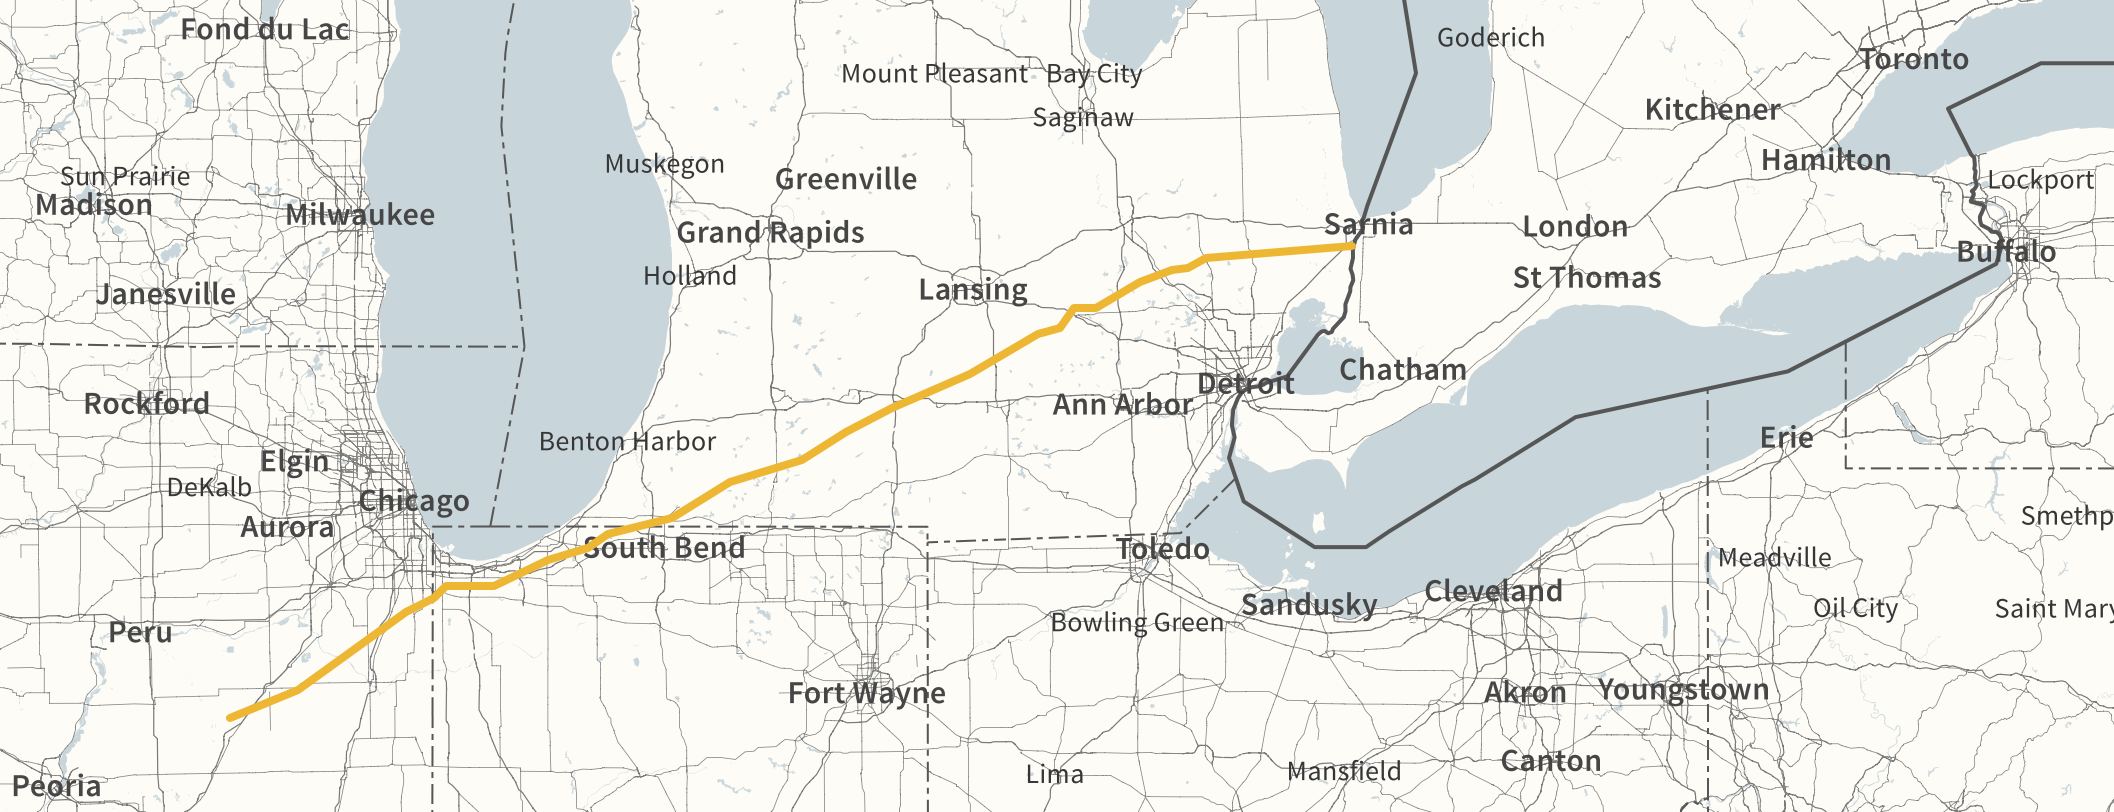 LINE 6B ROUTING (MAP COURTESY ENBRIDGE)